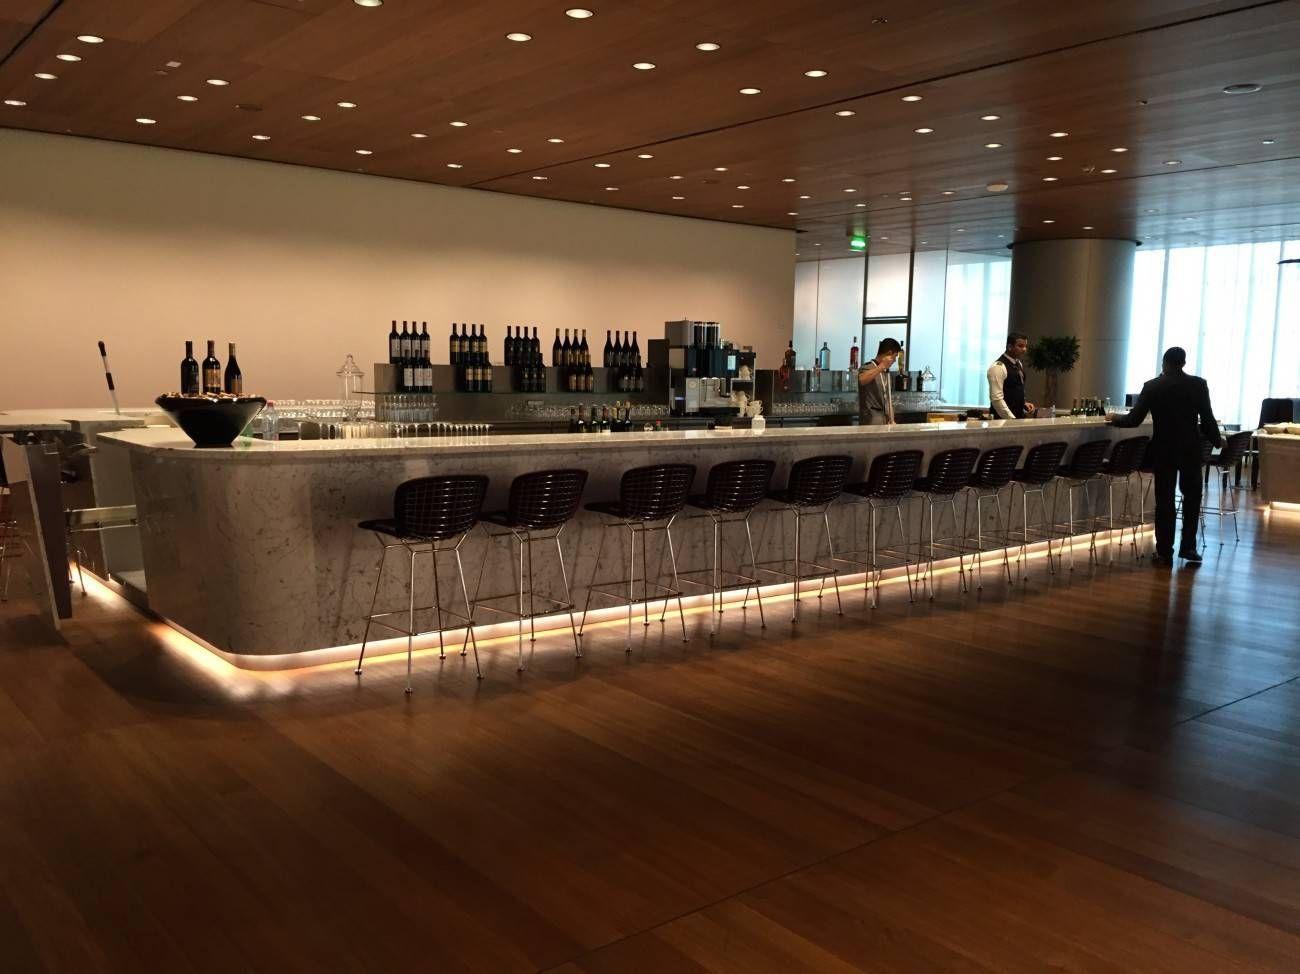 Sala VIP Al Mourjan Business Class da Qatar Airways – Aeroporto de  #9D6B2E 1300 974